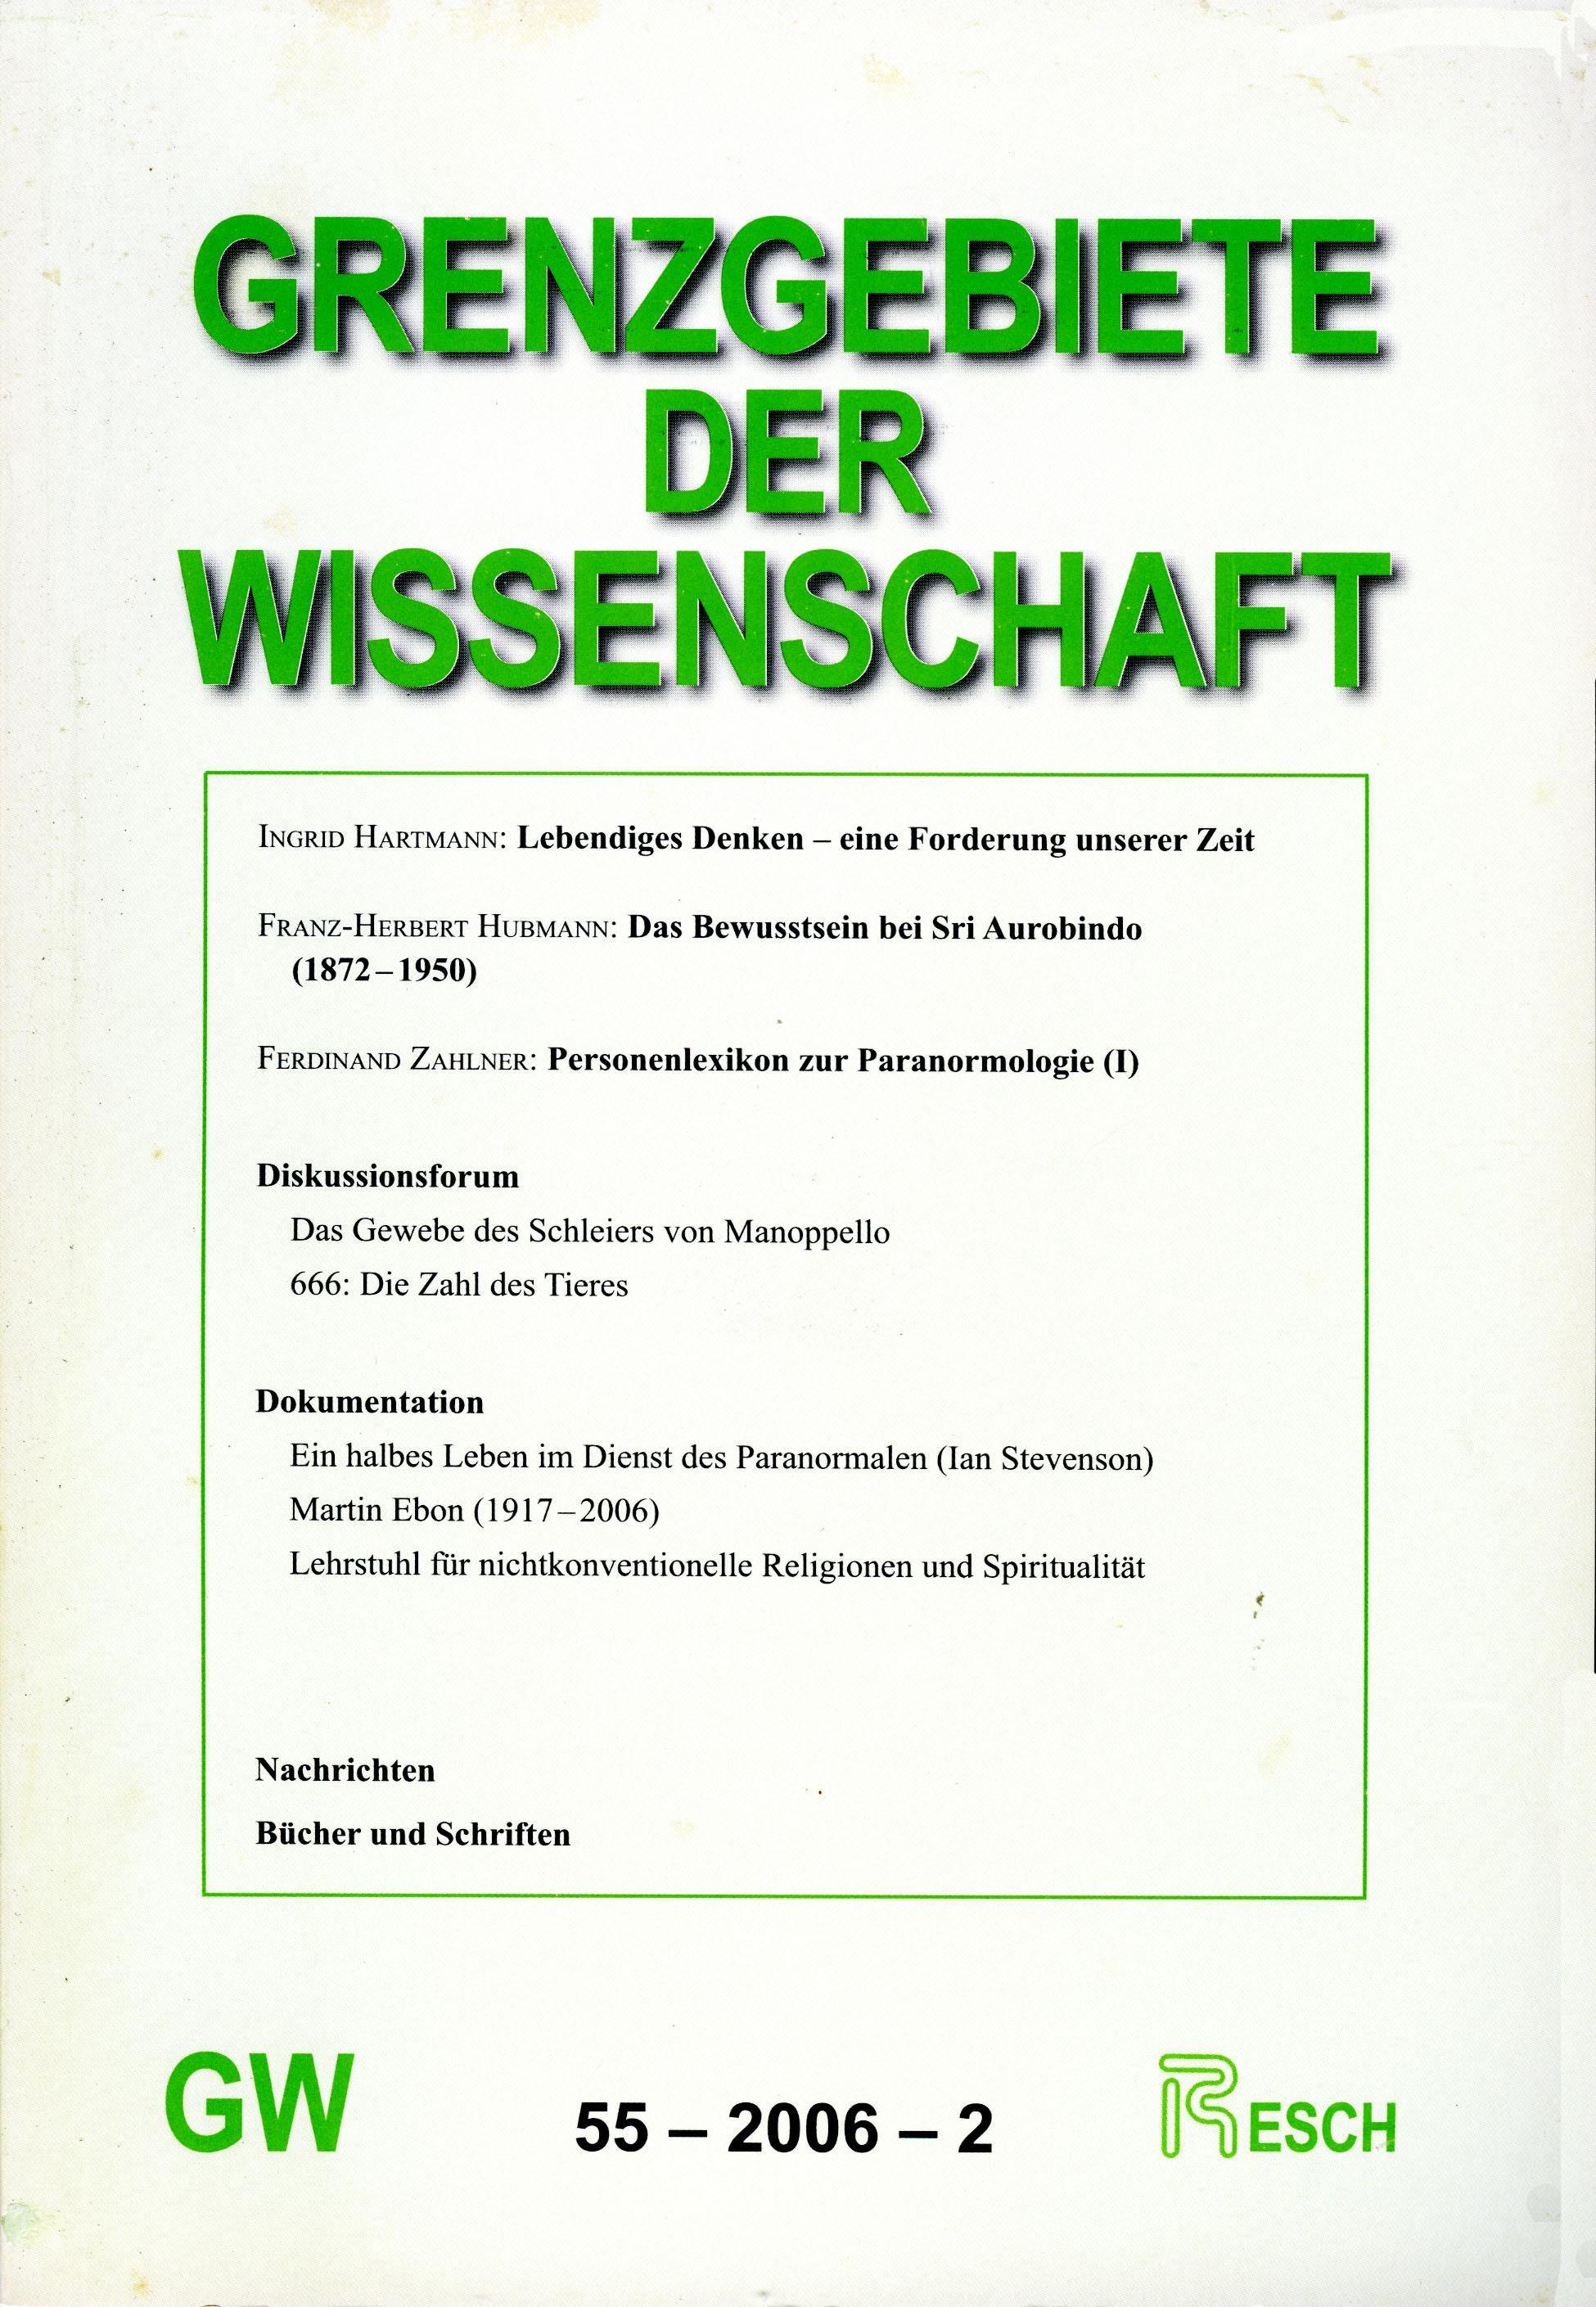 GW_2006_2